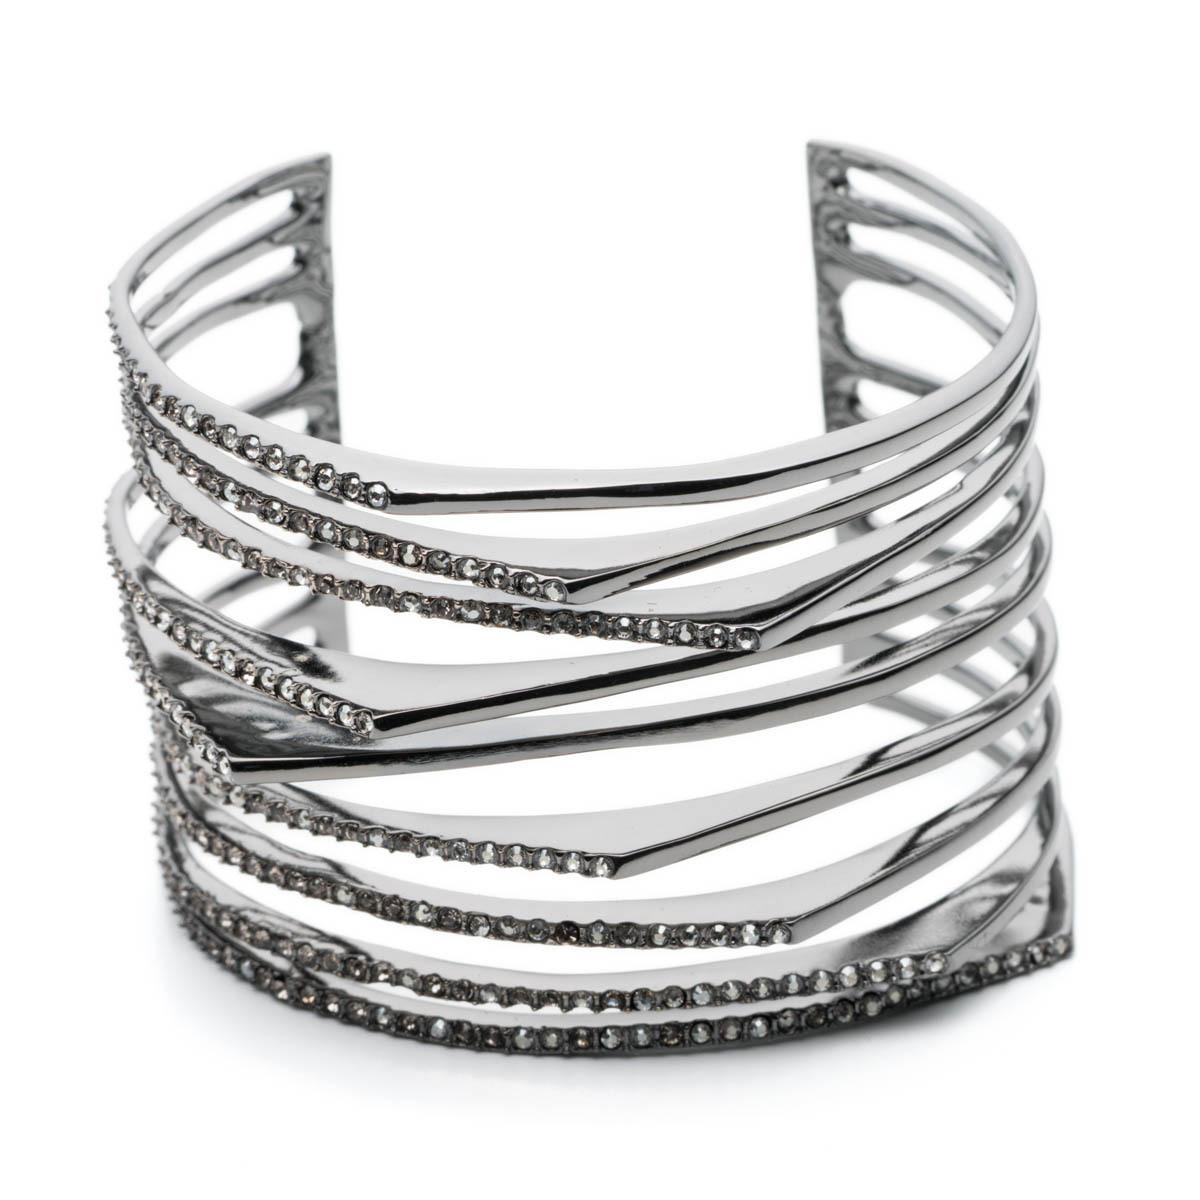 Crystal Encrusted Origami Peeks Cuff Bracelet